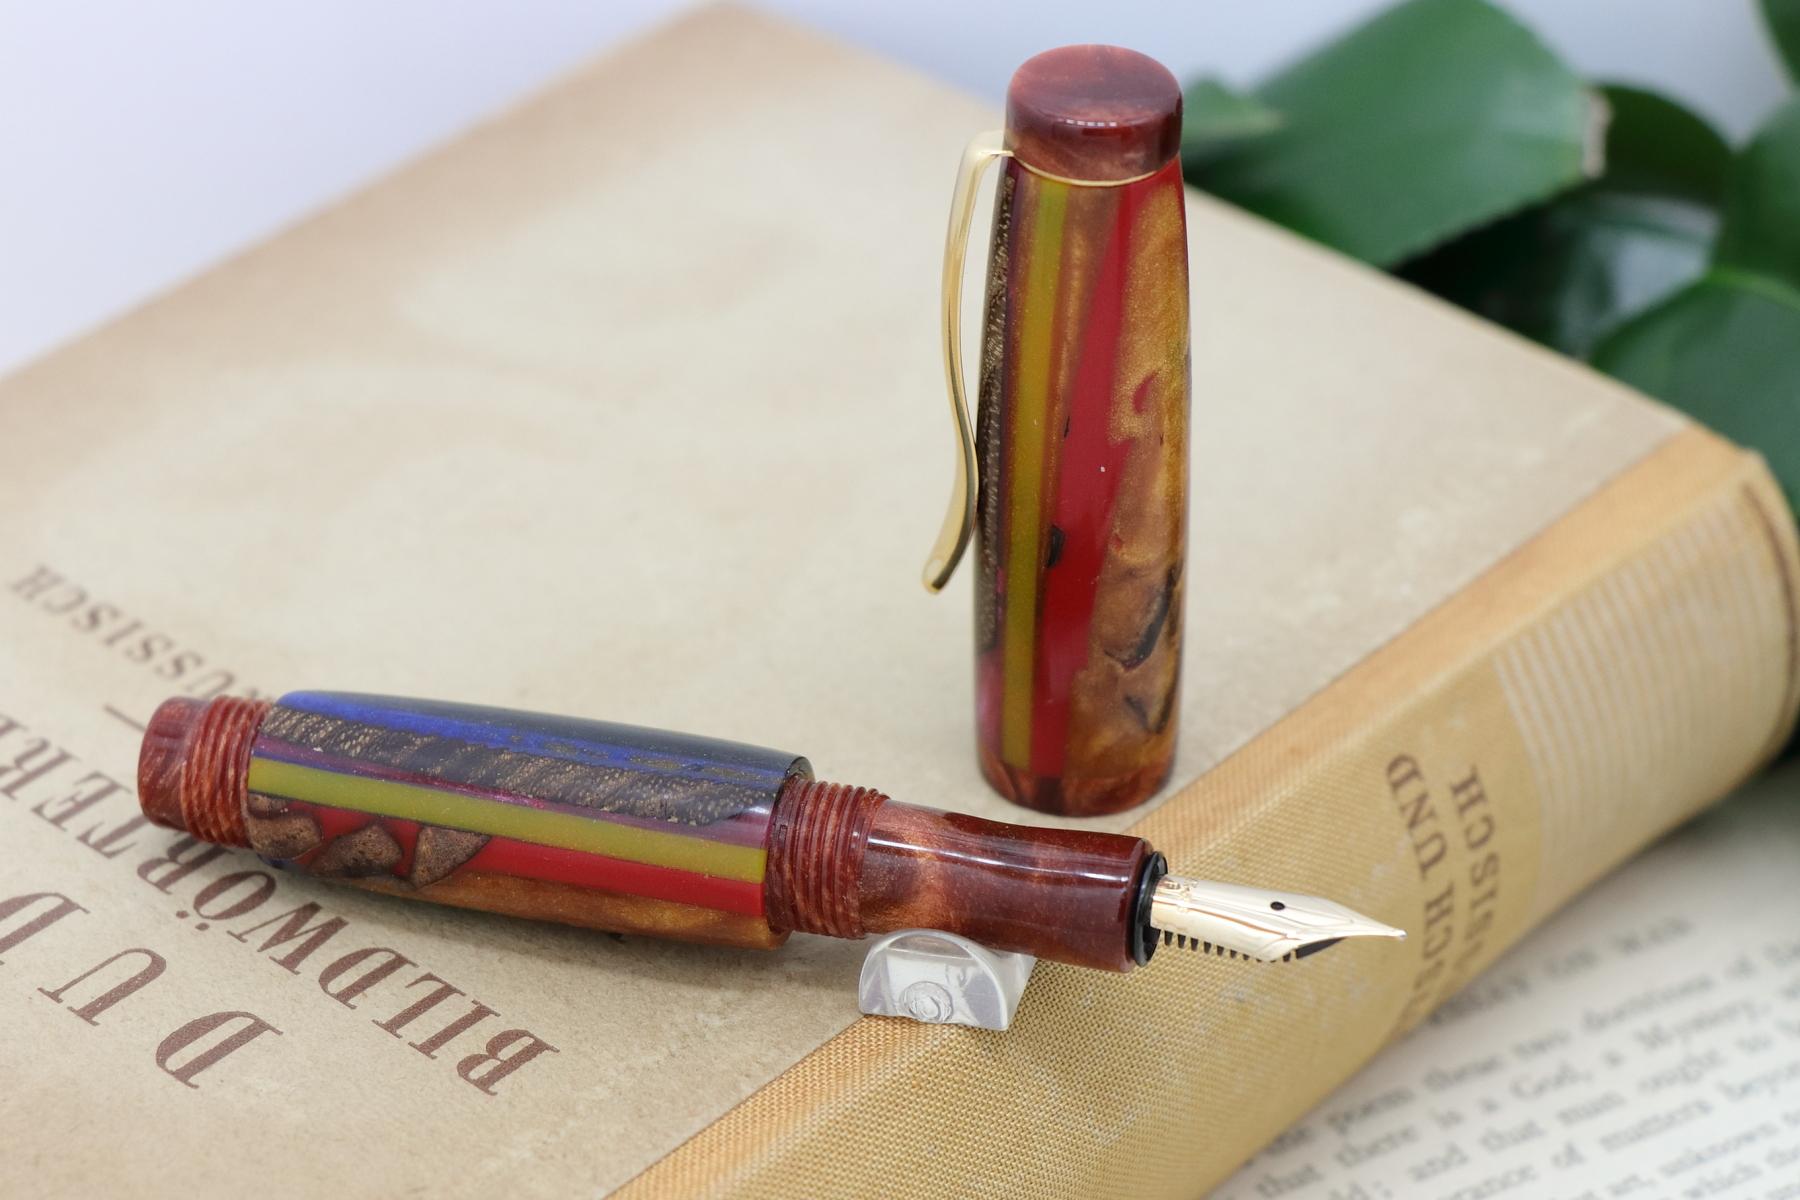 Symphoniae mini シリーズの新作万年筆を追加致しました。全て一点物で販売中です。